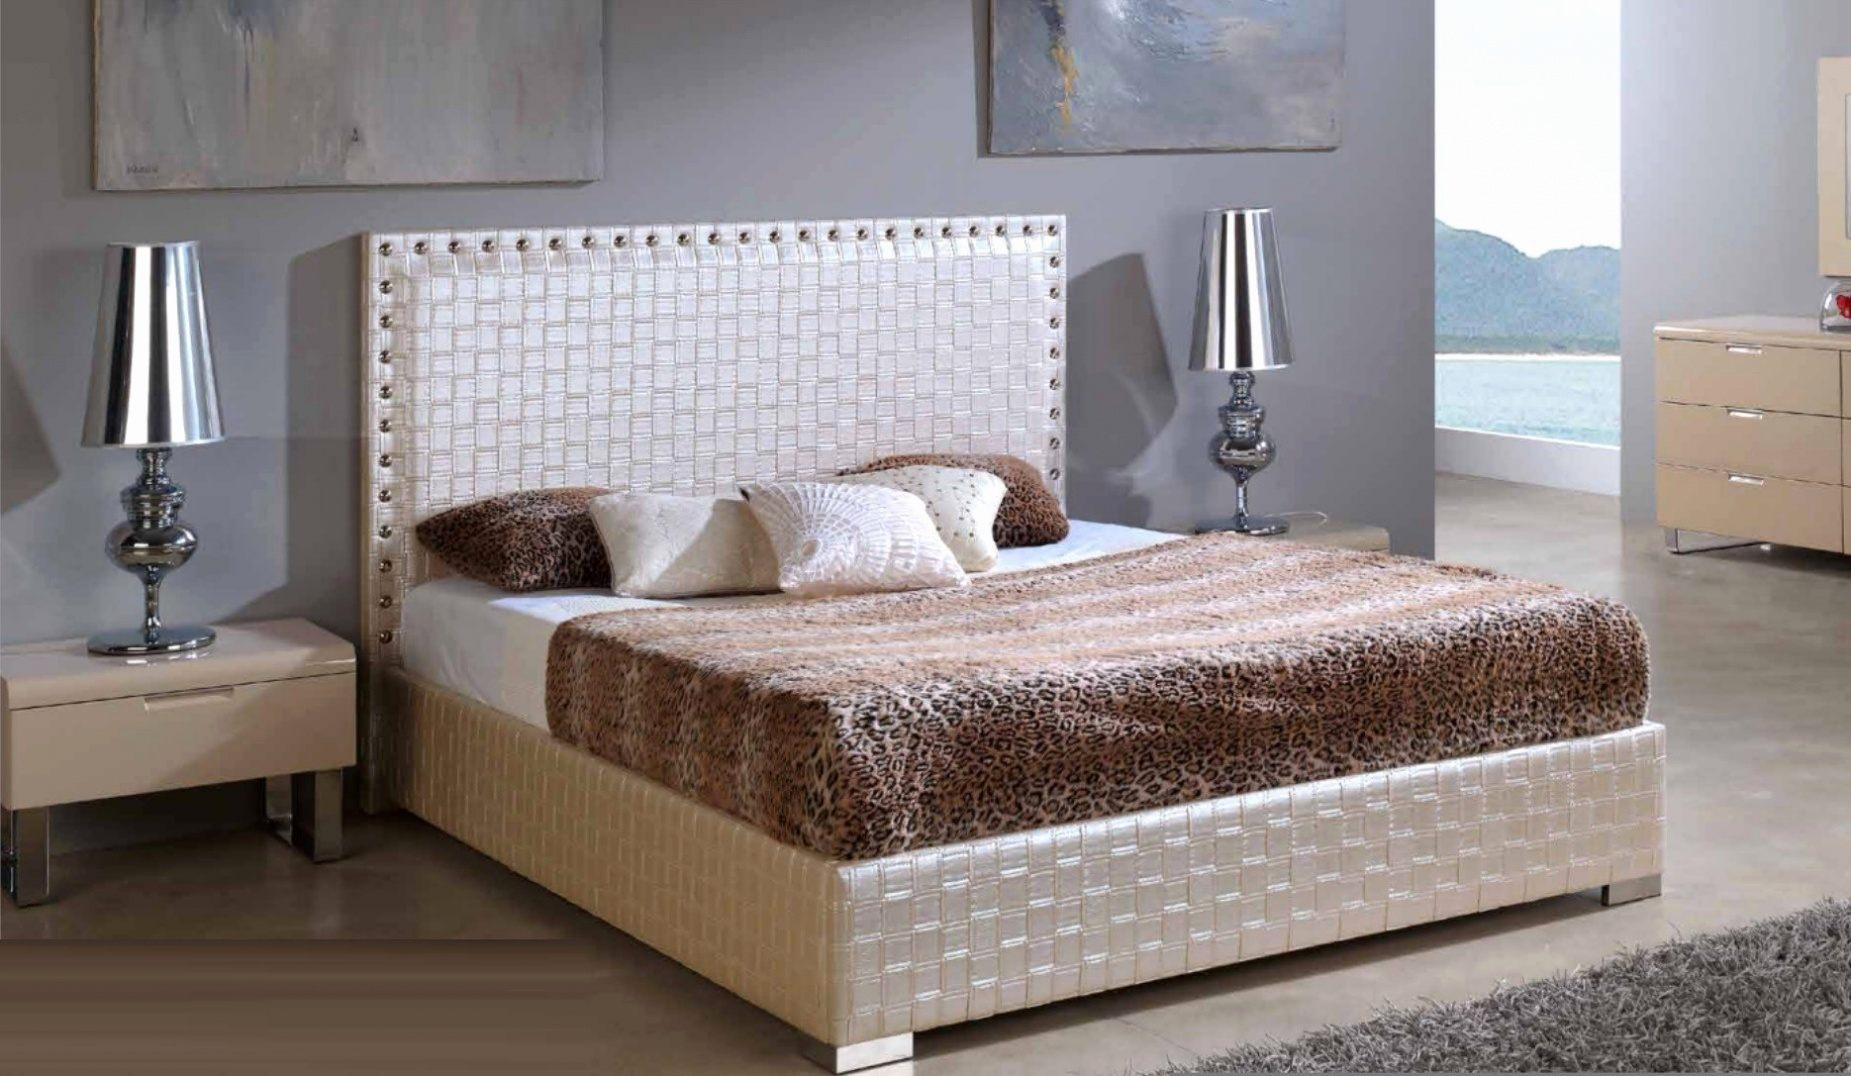 Tete De Lit Ikea 160 Magnifique sove Tete De Lit 160 Blanc — sovedis Aquatabs